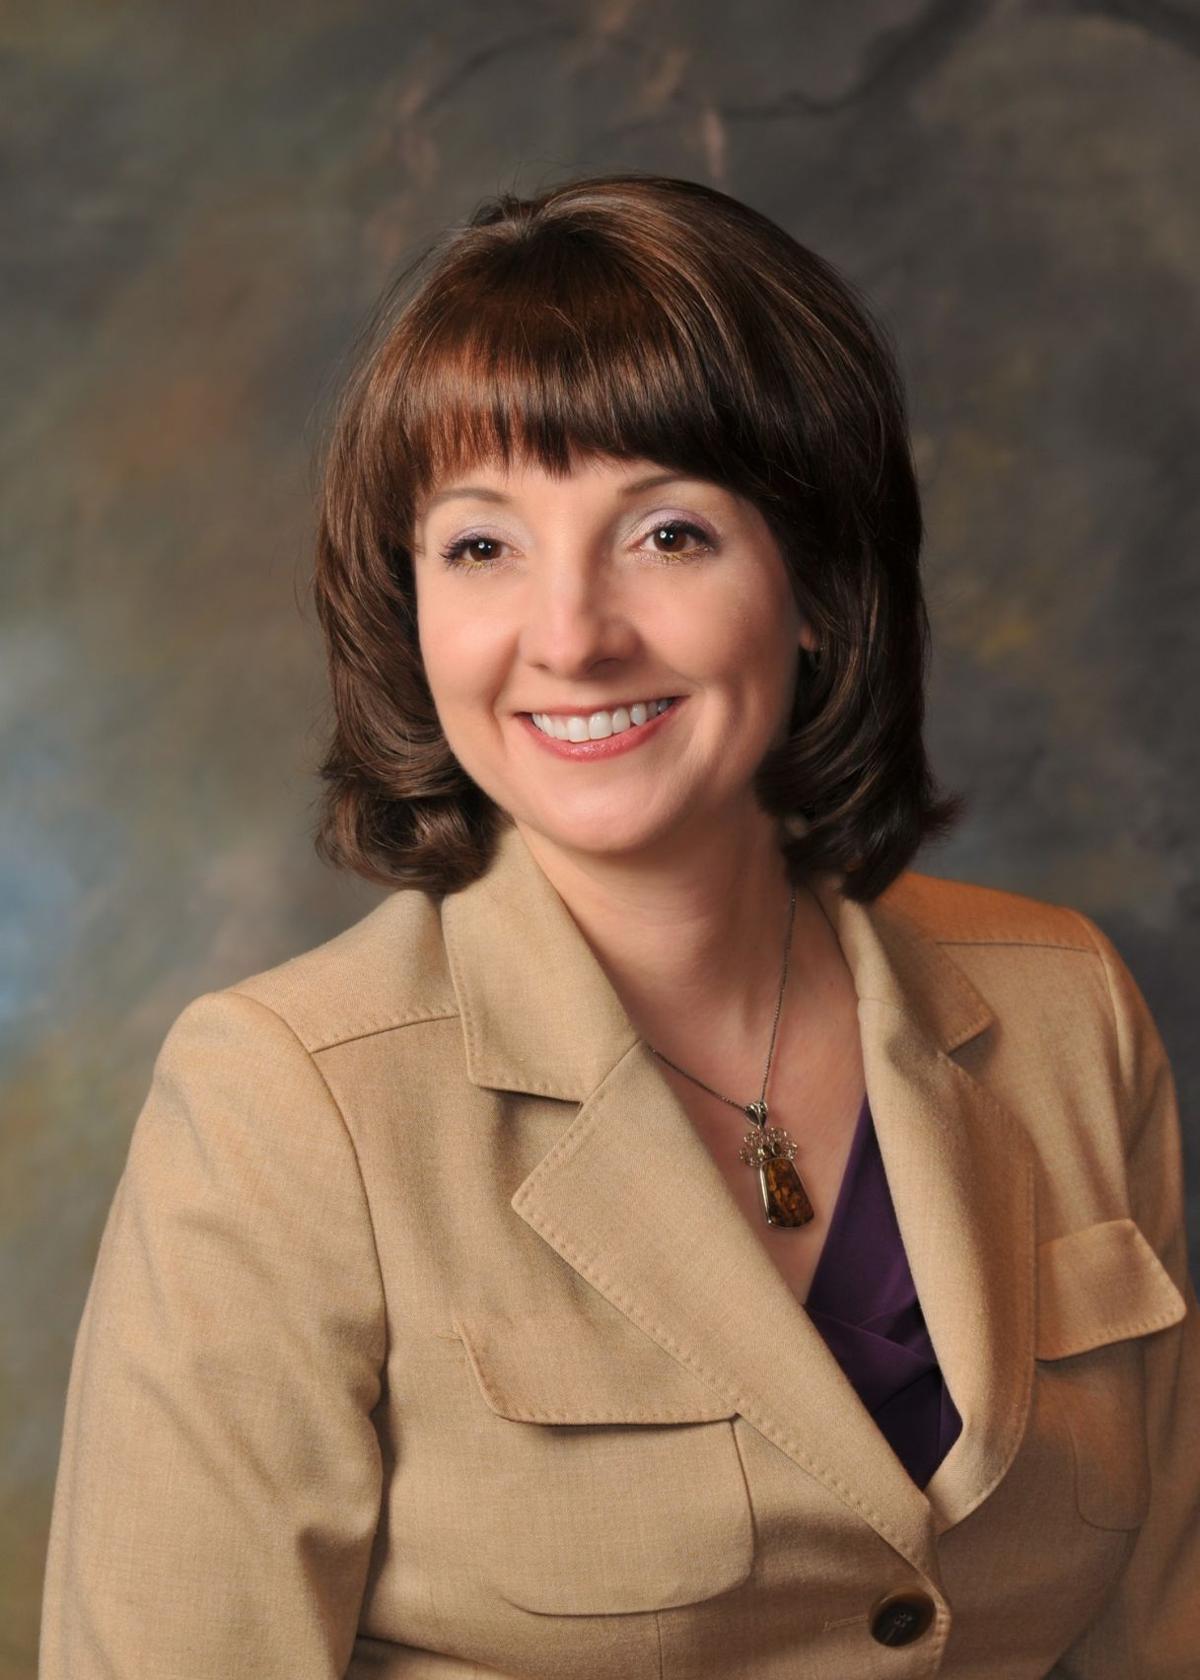 Kimberly Hough